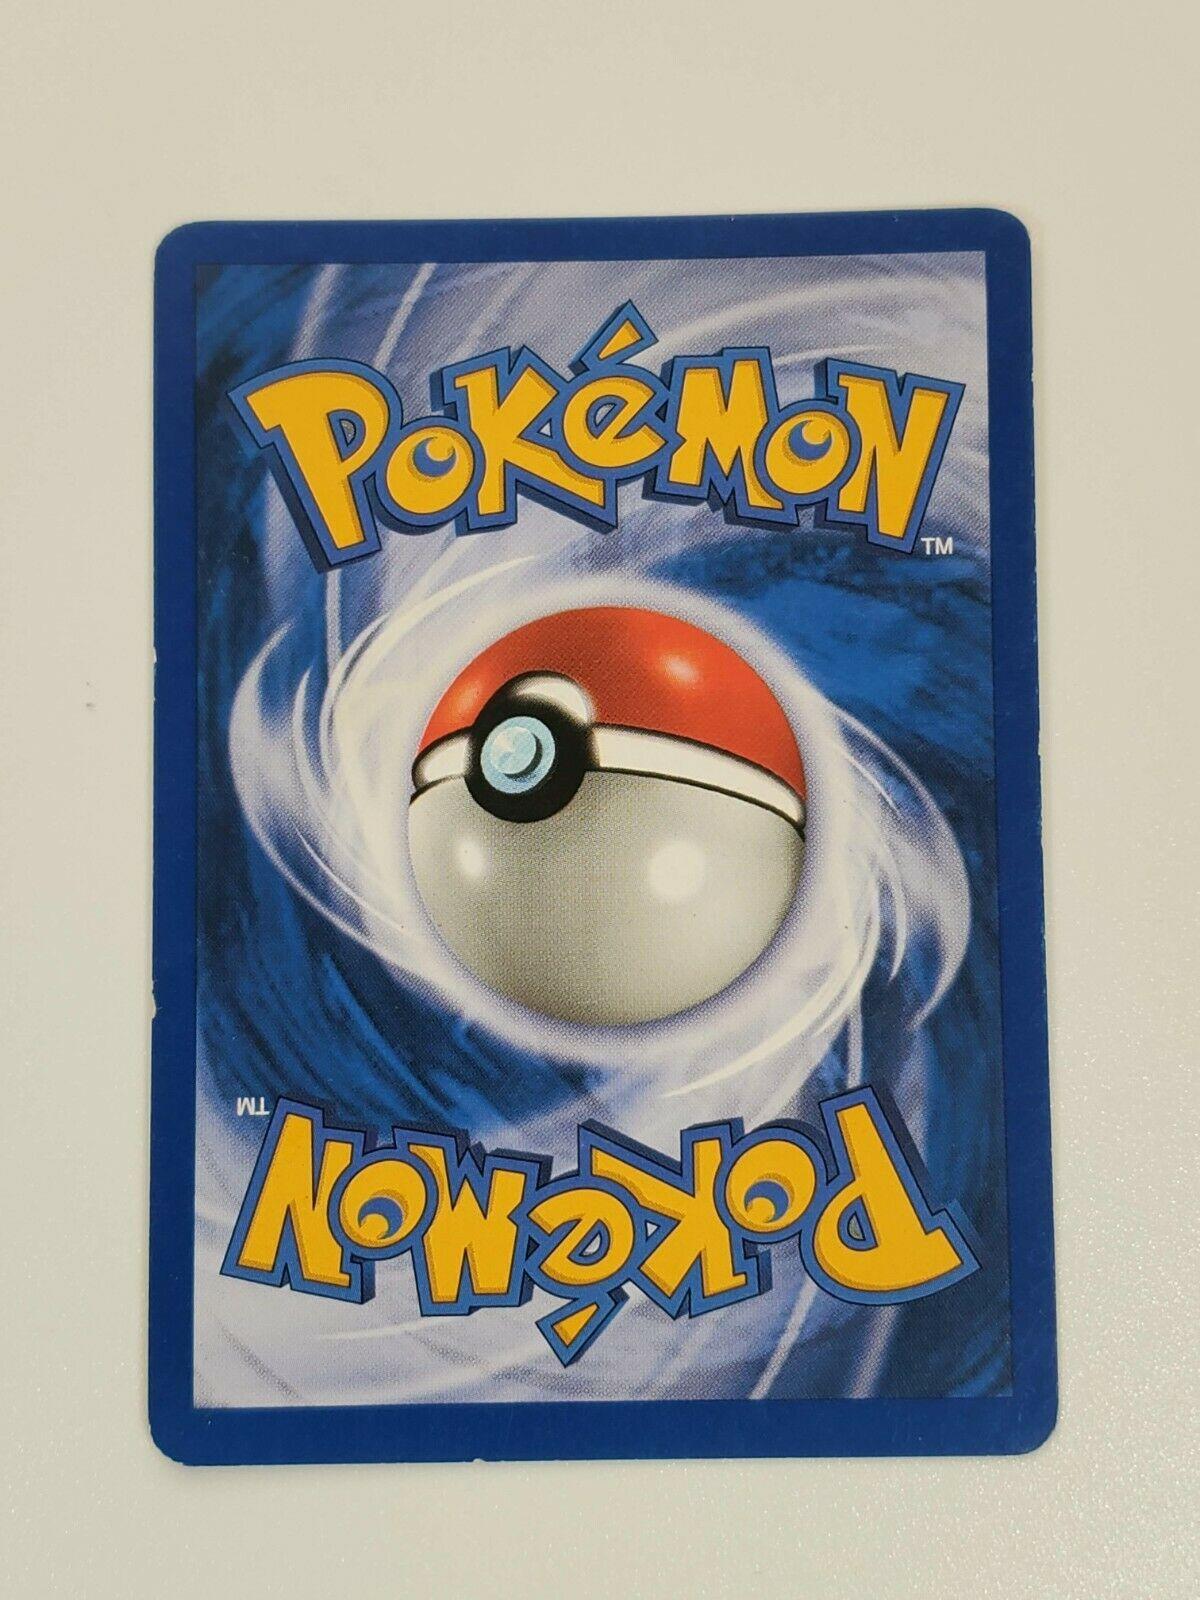 Pokemon Card: POLITOED - #8/75 Neo Discovery - Holo Rare - LP - Image 2